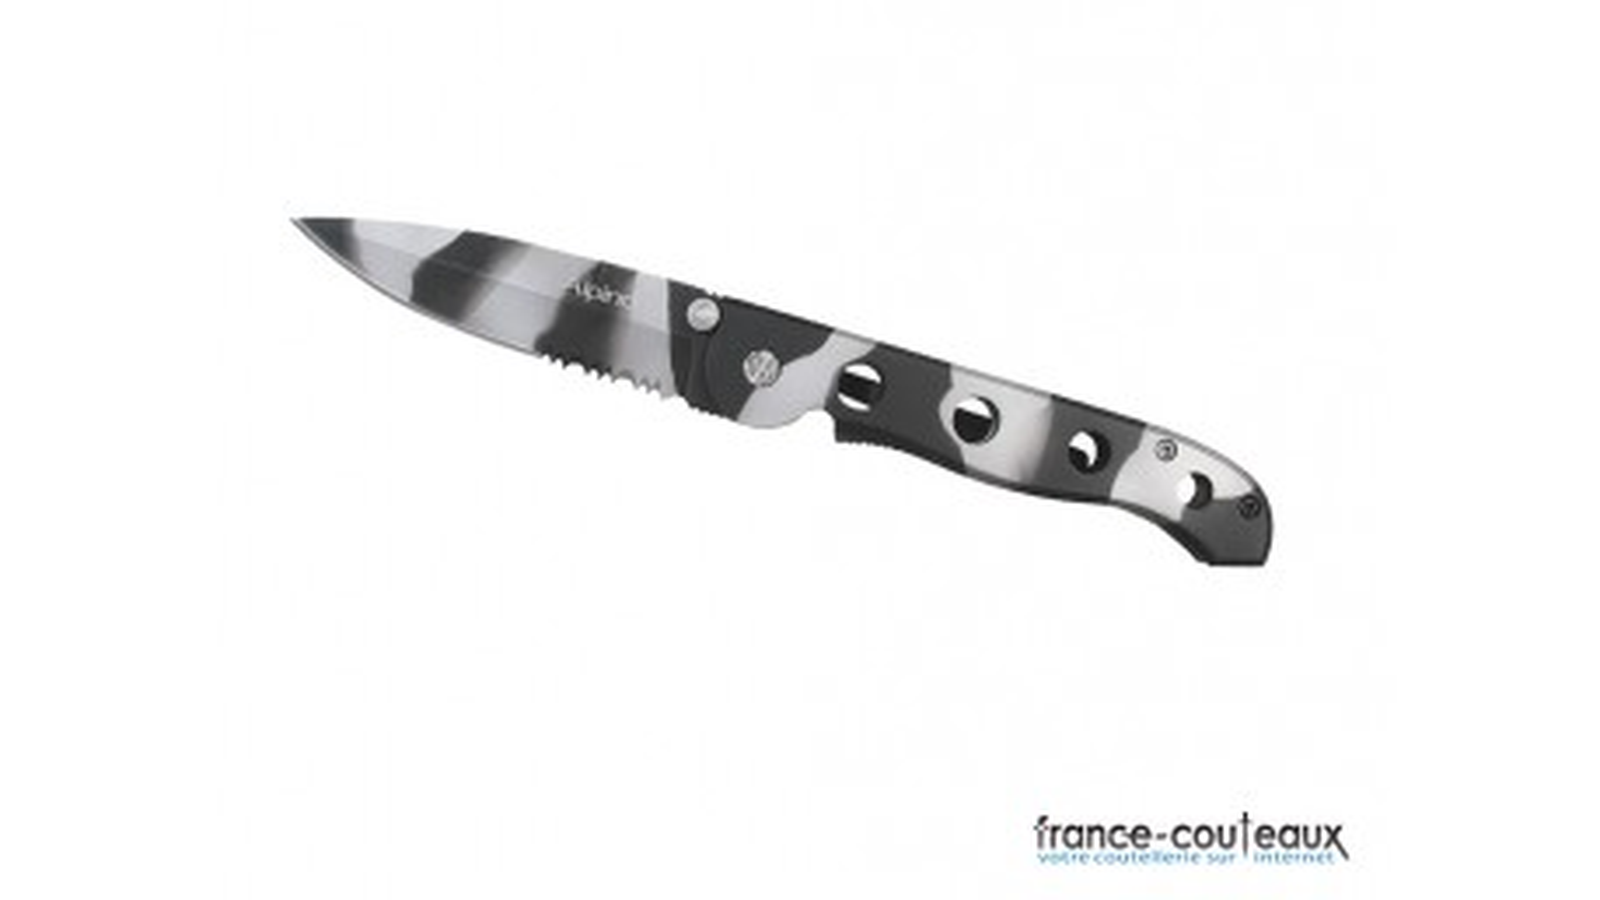 Coffret couteau Alpino Camo lame mixte